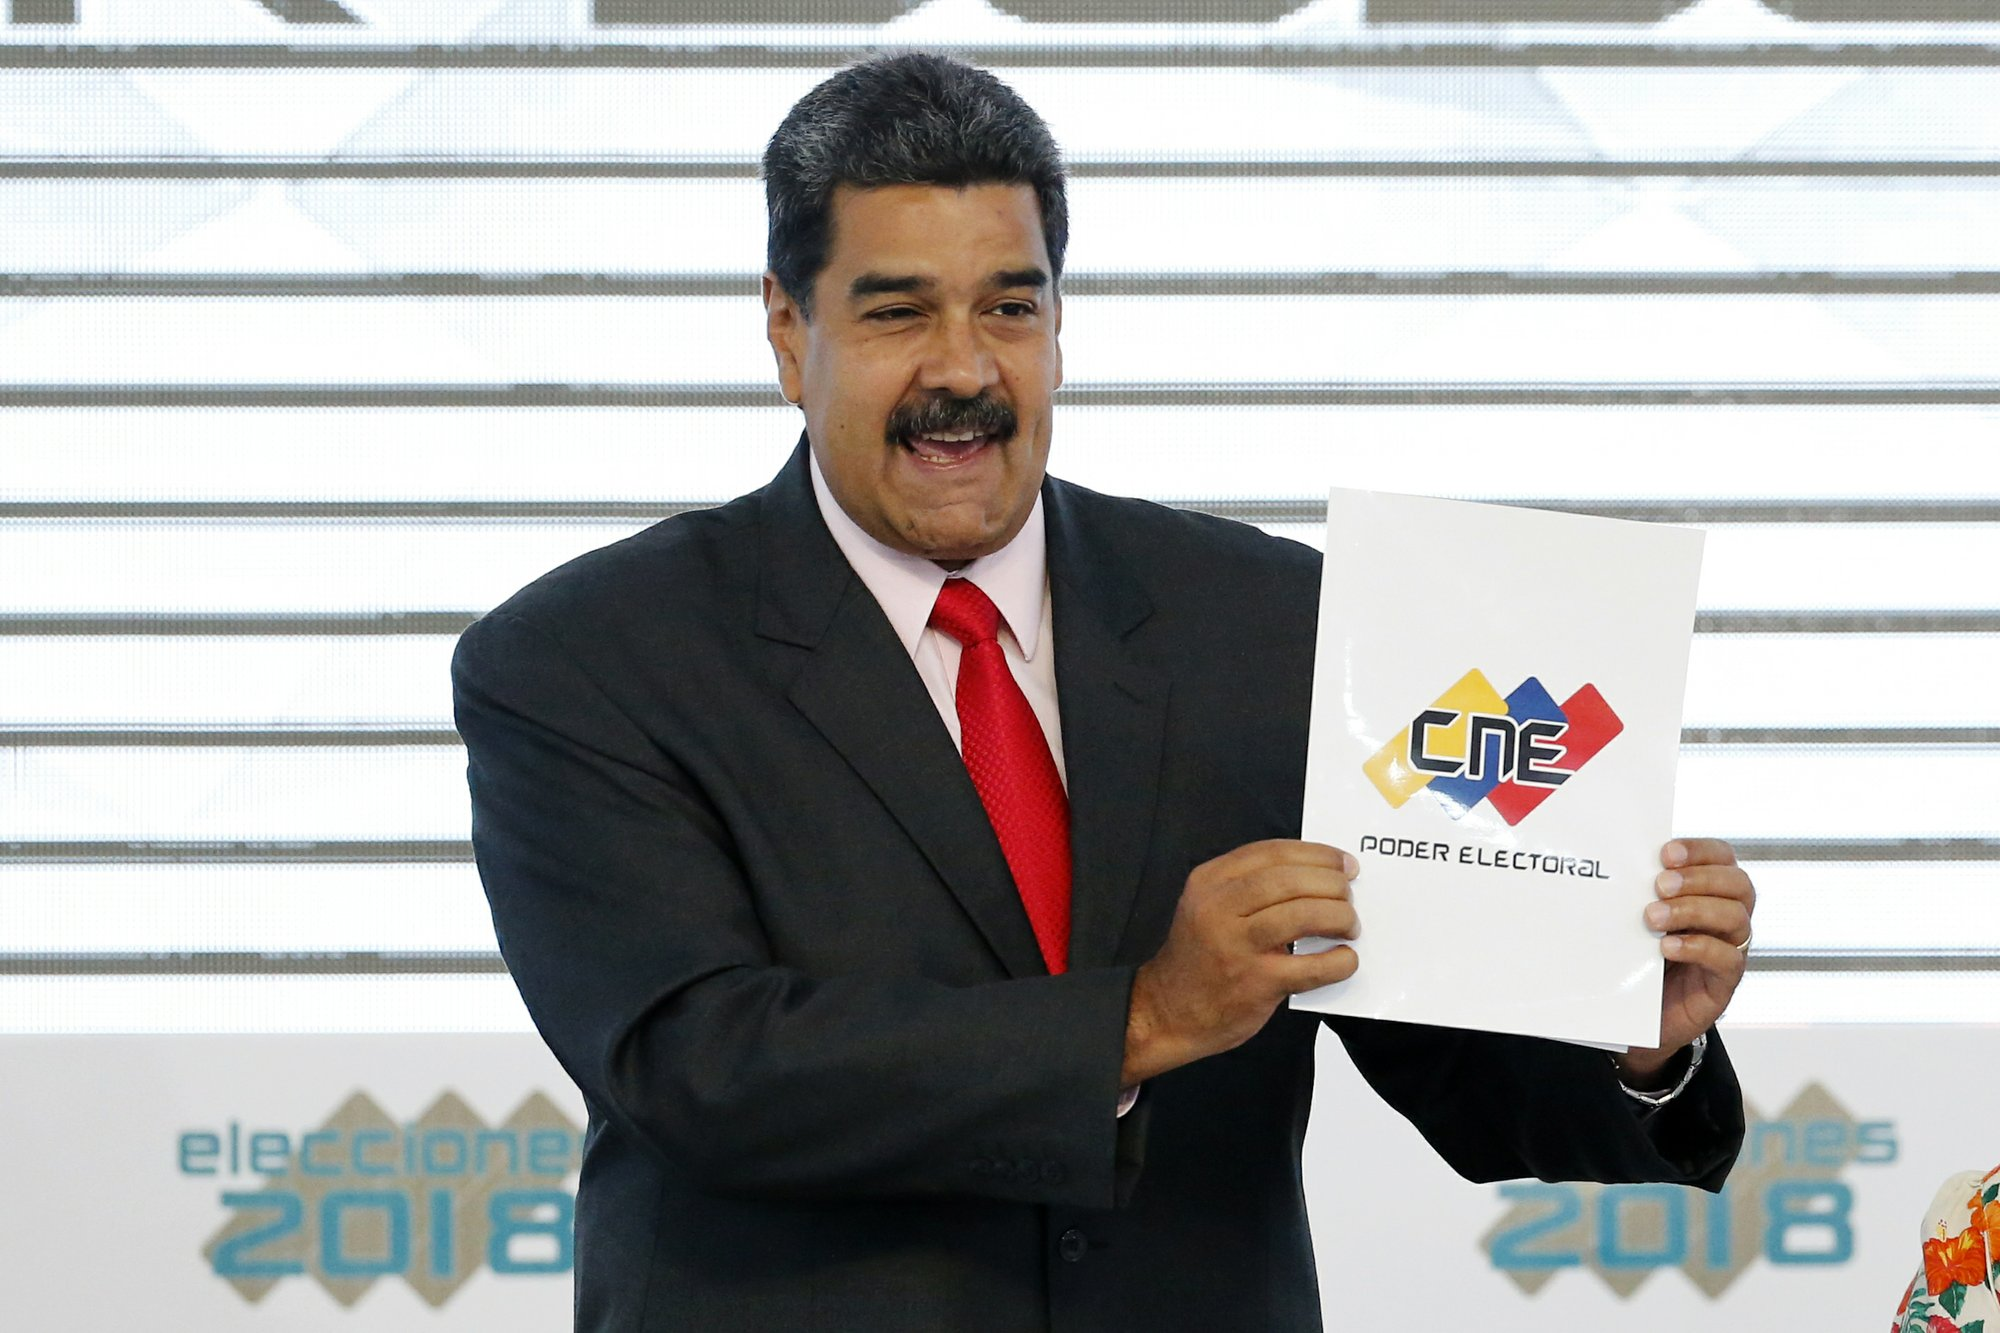 Trump pressed aides on Venezuela invasion, US official says